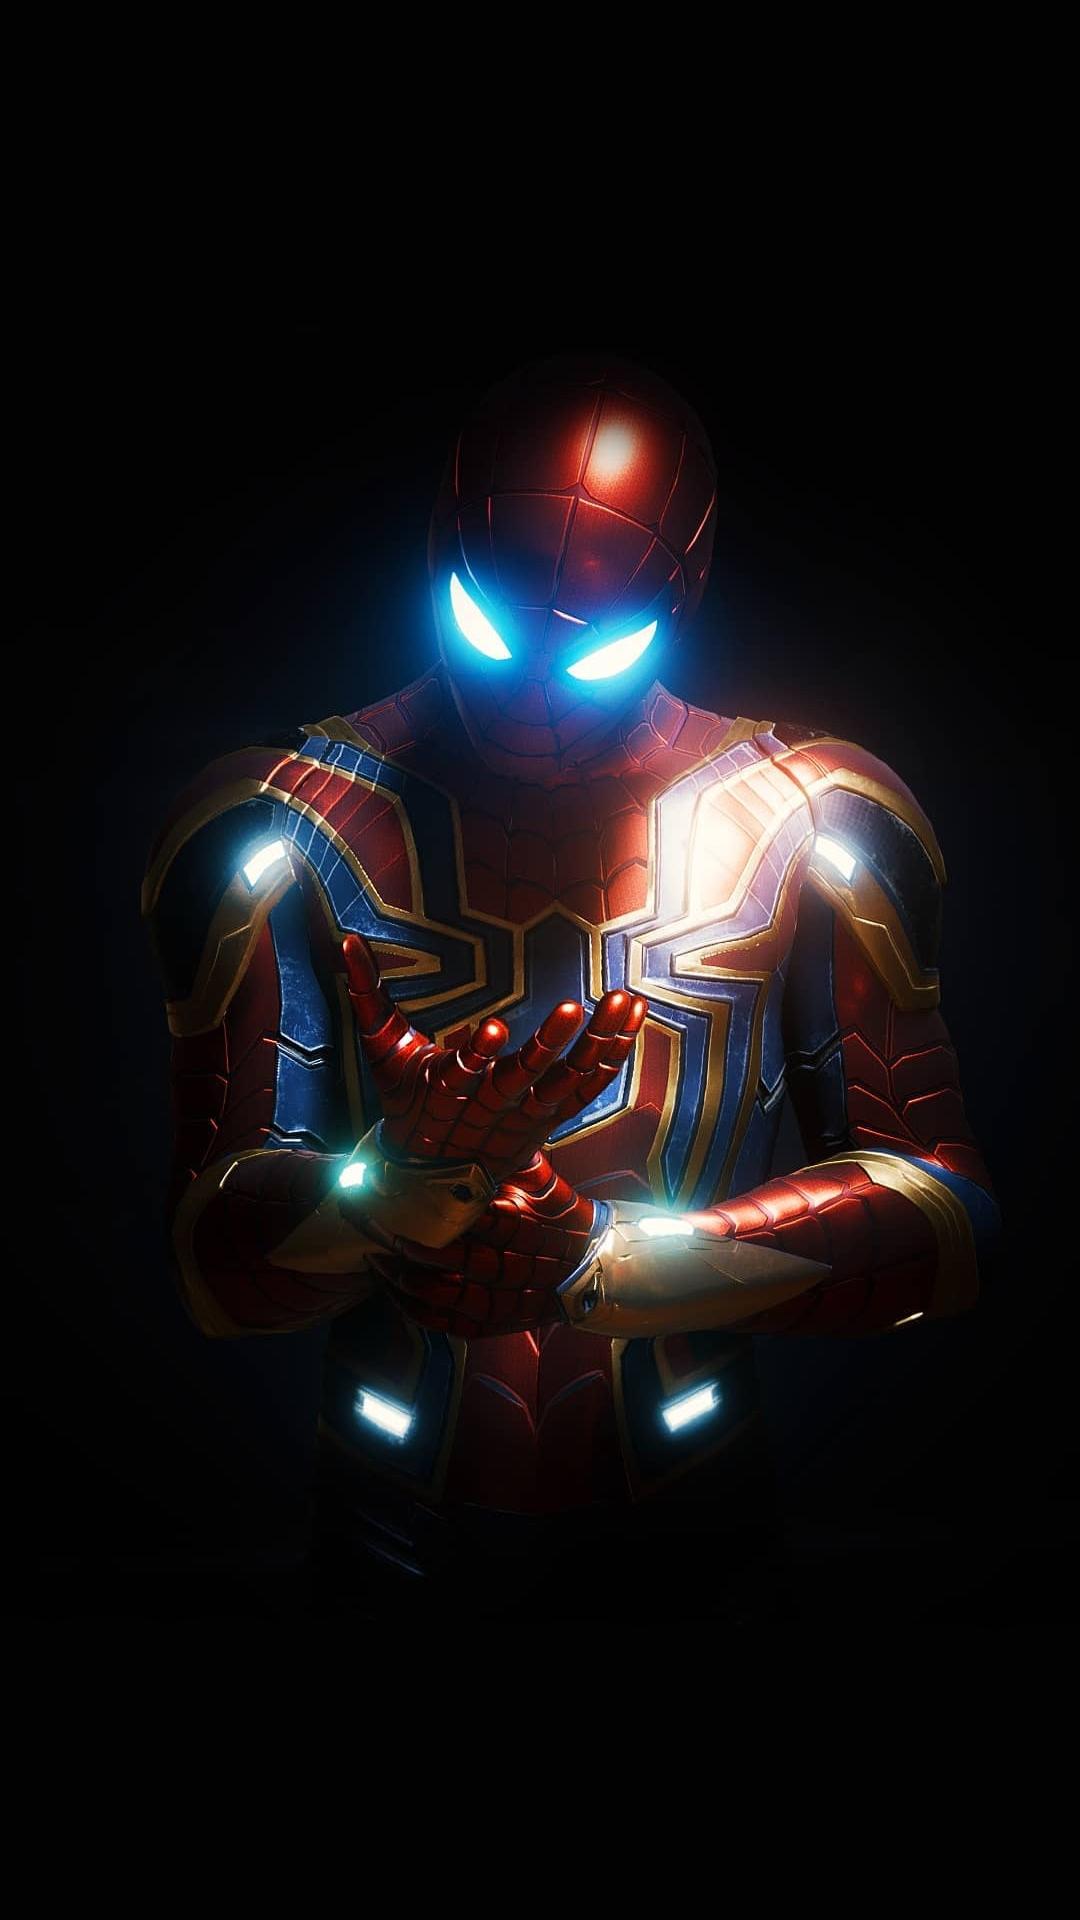 Spider Armor Mark 4 iPhone Wallpaper